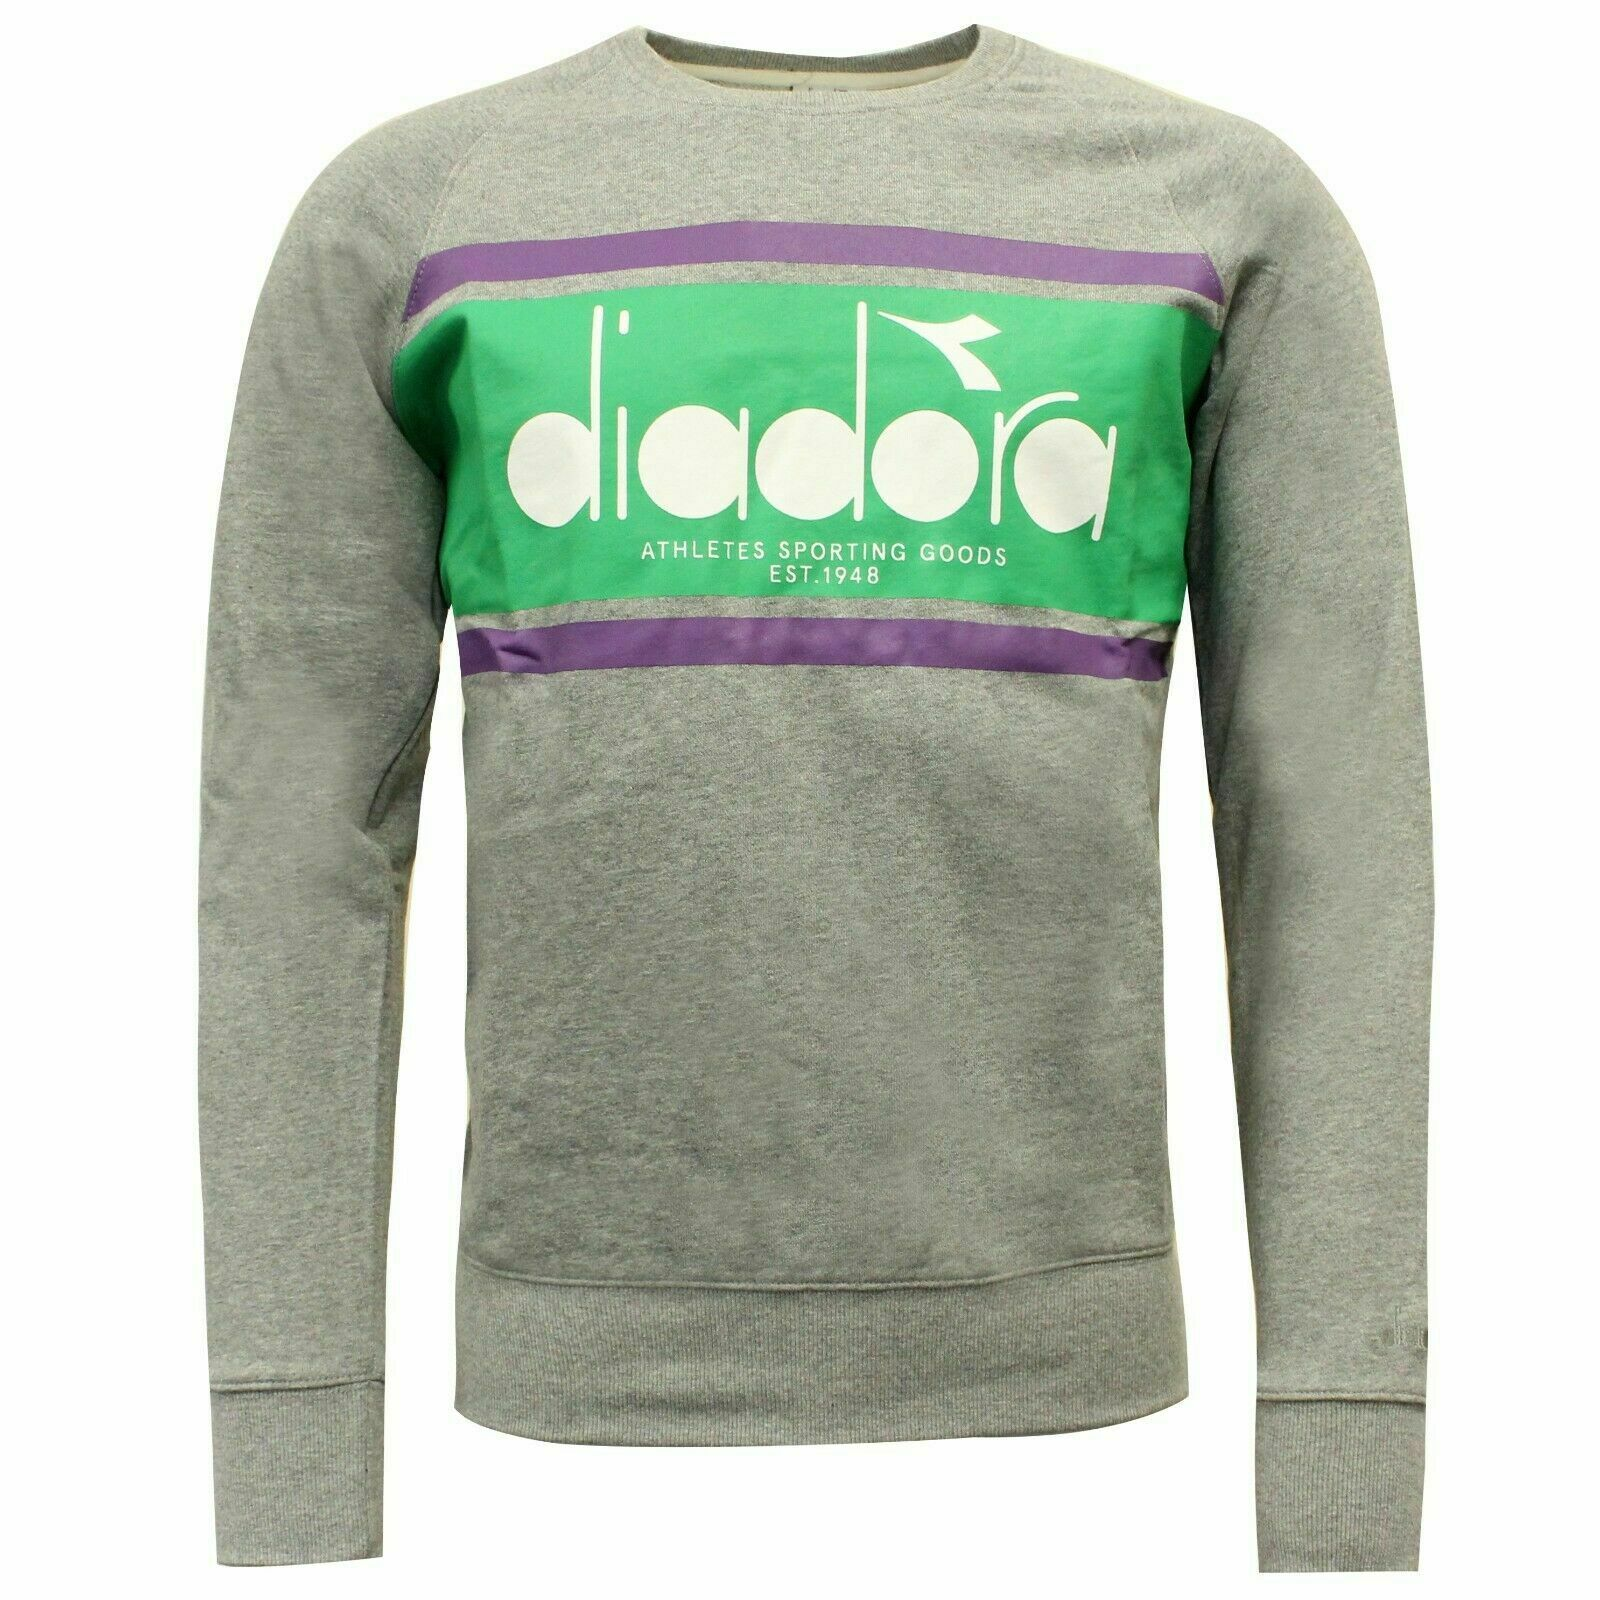 Diadora Sportswear Mens Crew Spectra Sweatshirt Jumper 502.173795 C7518 A62B